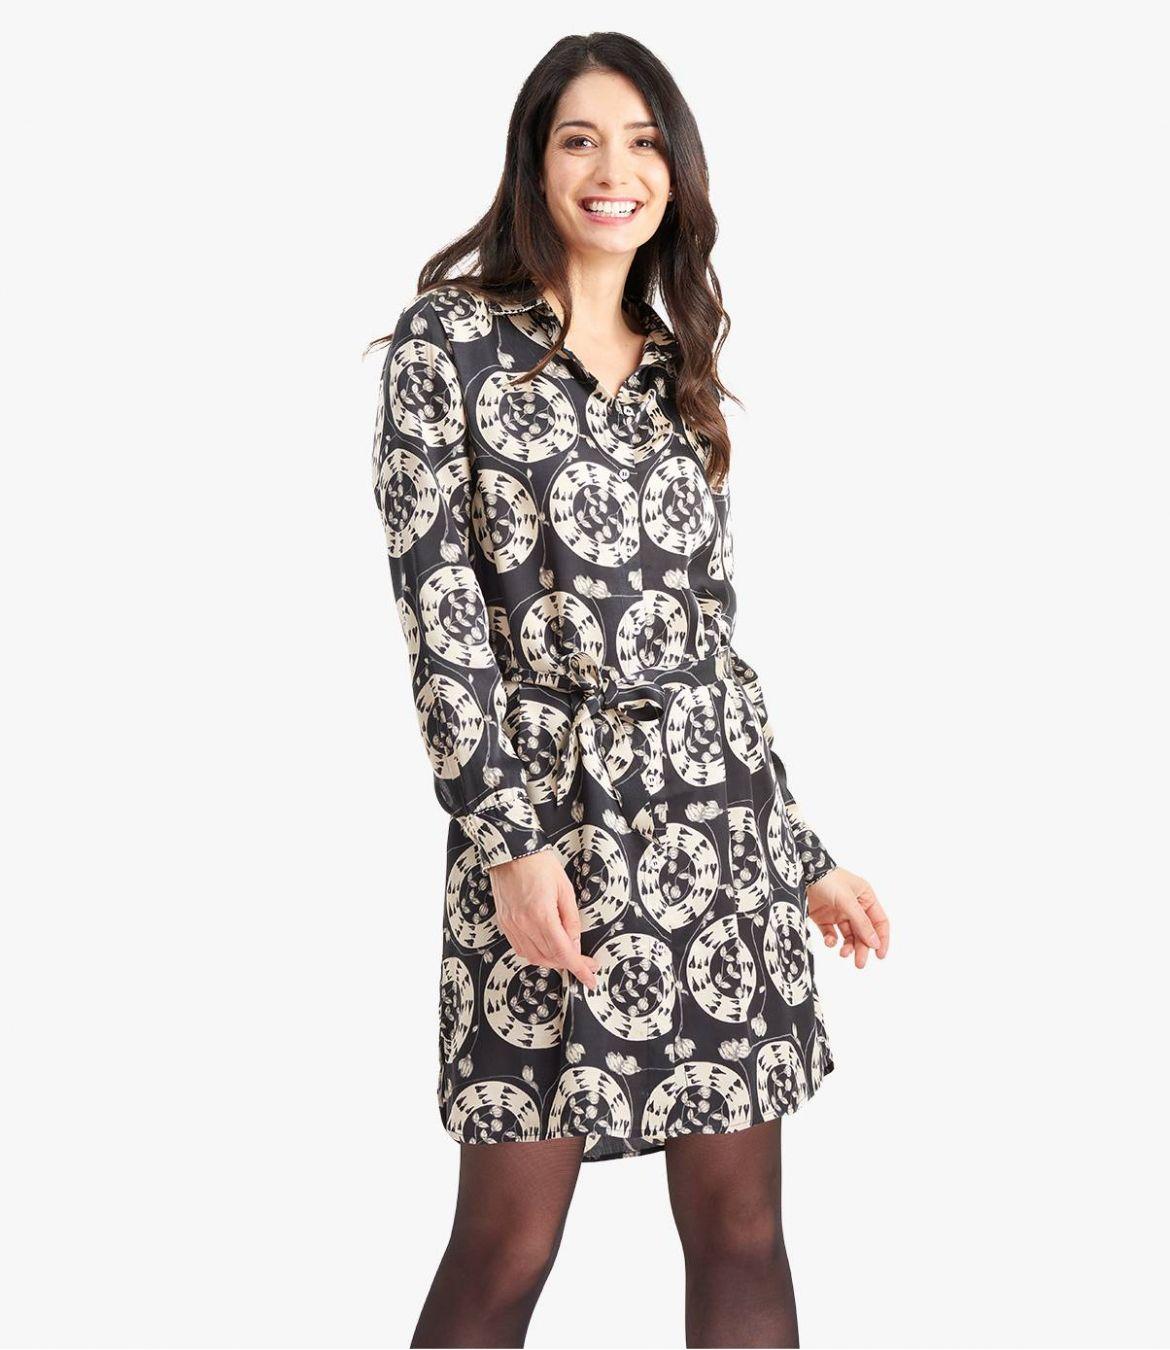 KAIA EVE Robe en Modal satin pour Femme - 1